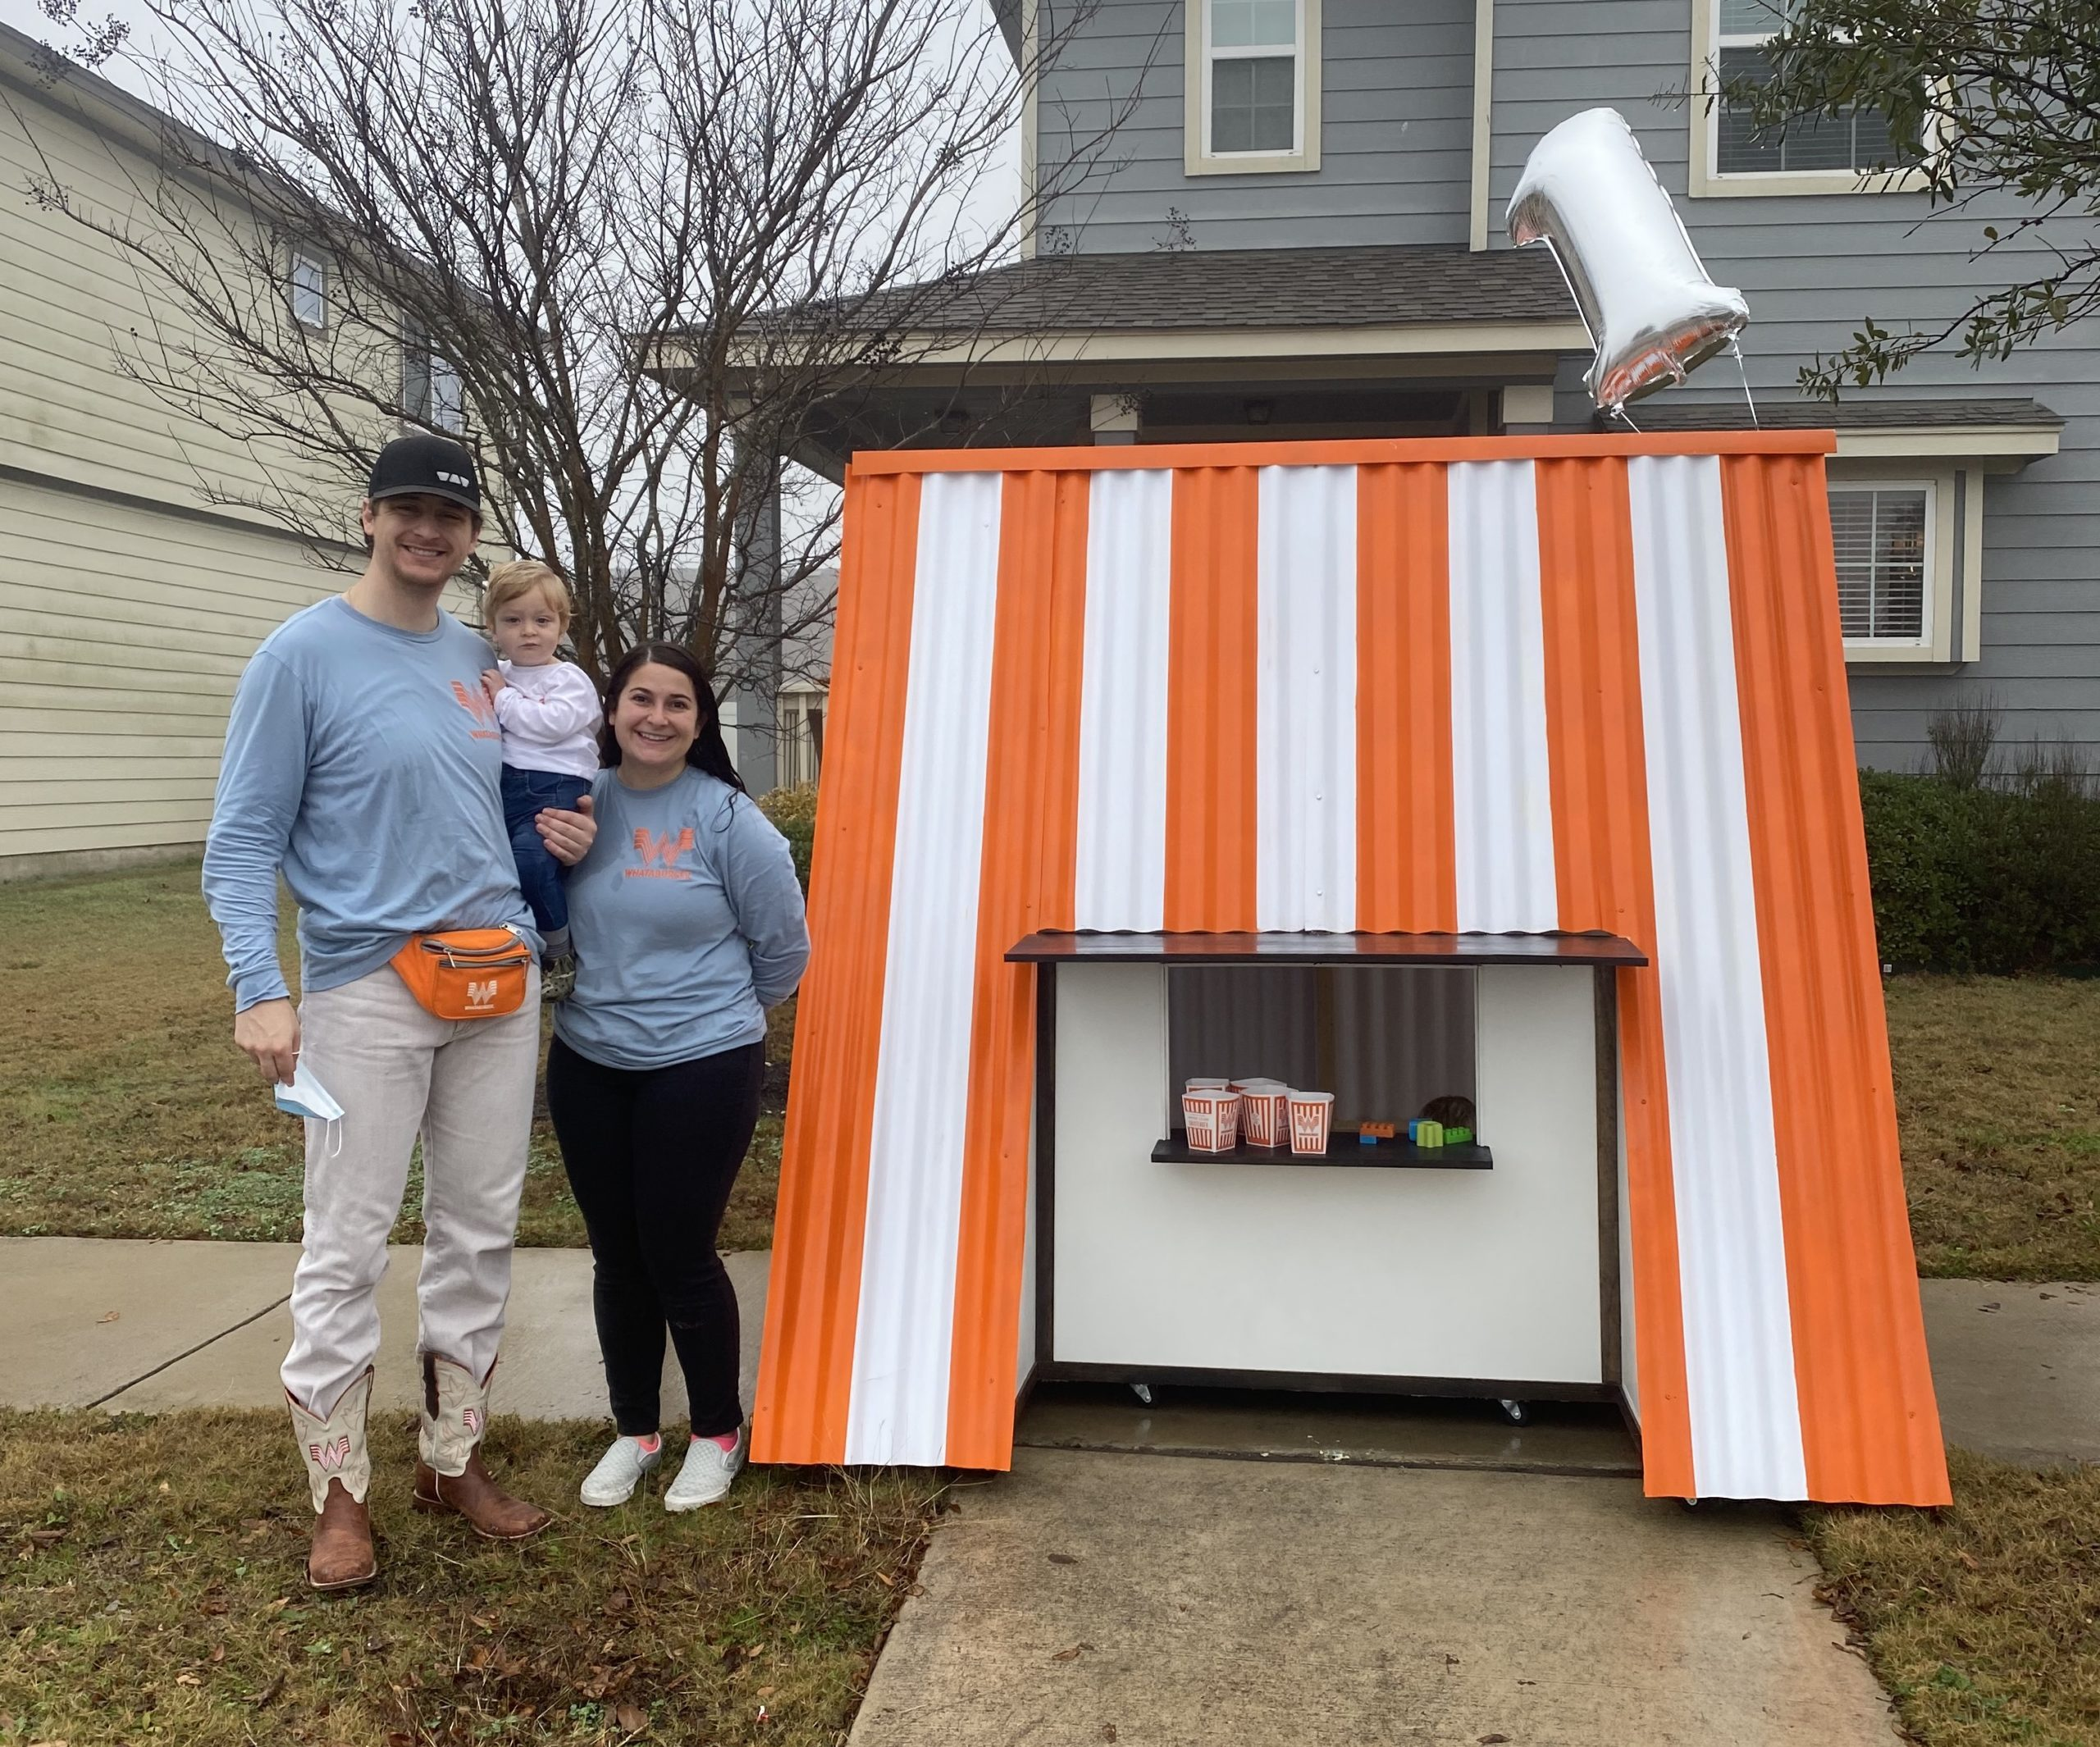 This Texas Couple Created a Whataburger Playhouse for Their Son's First Birthday - San Antonio Magazine